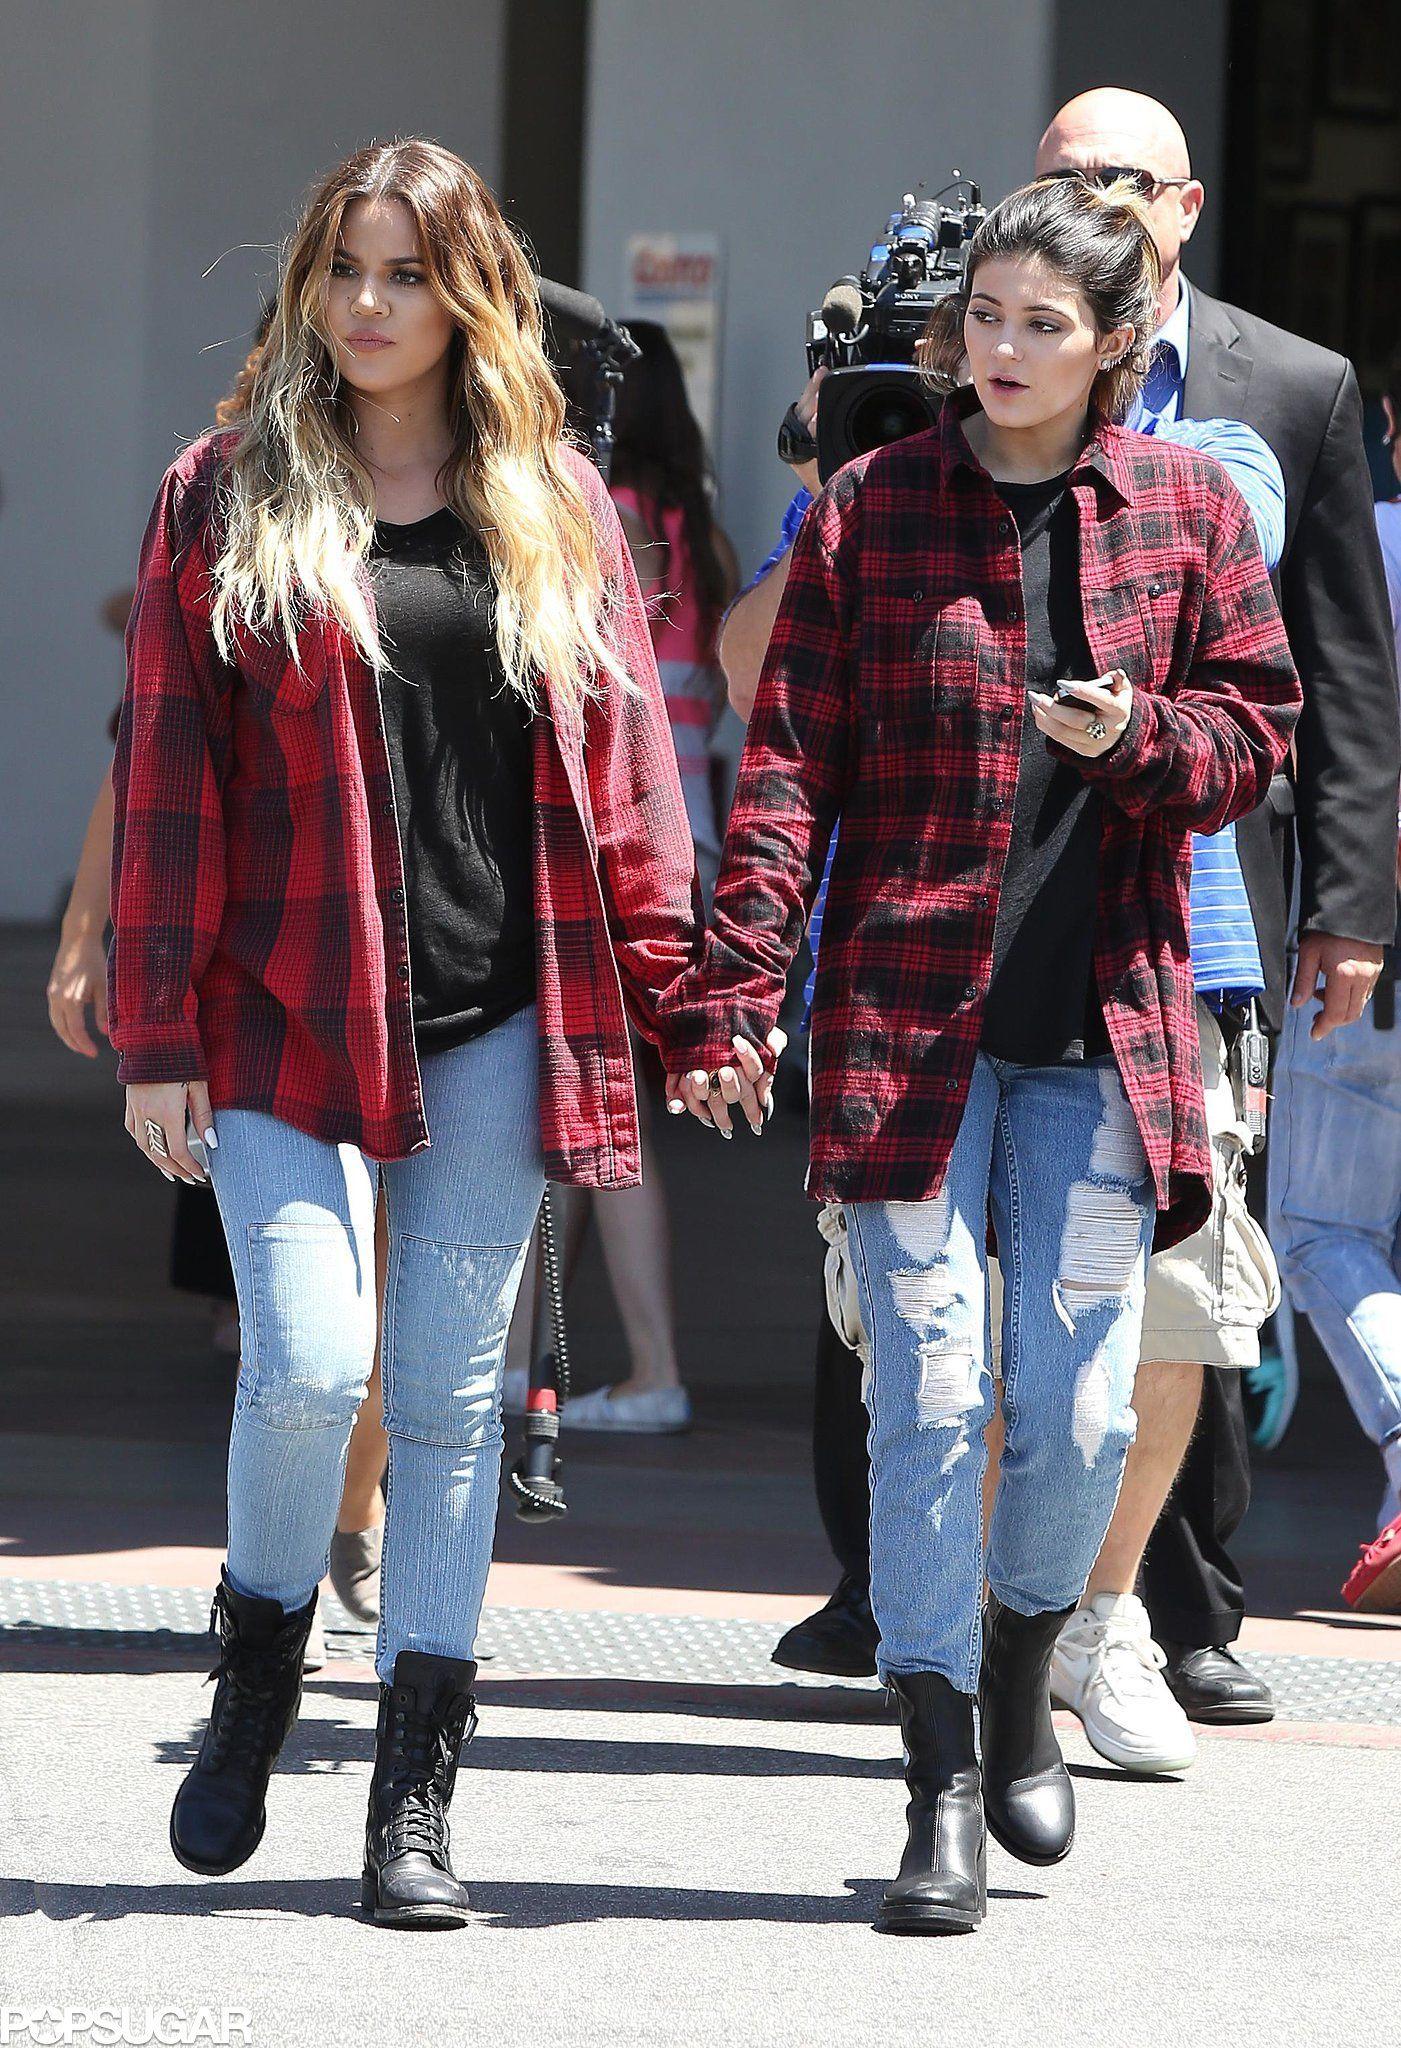 Khloe kardashian flannel shirt  Pin by Kardashian Jenner on Kendall Jenner  Pinterest